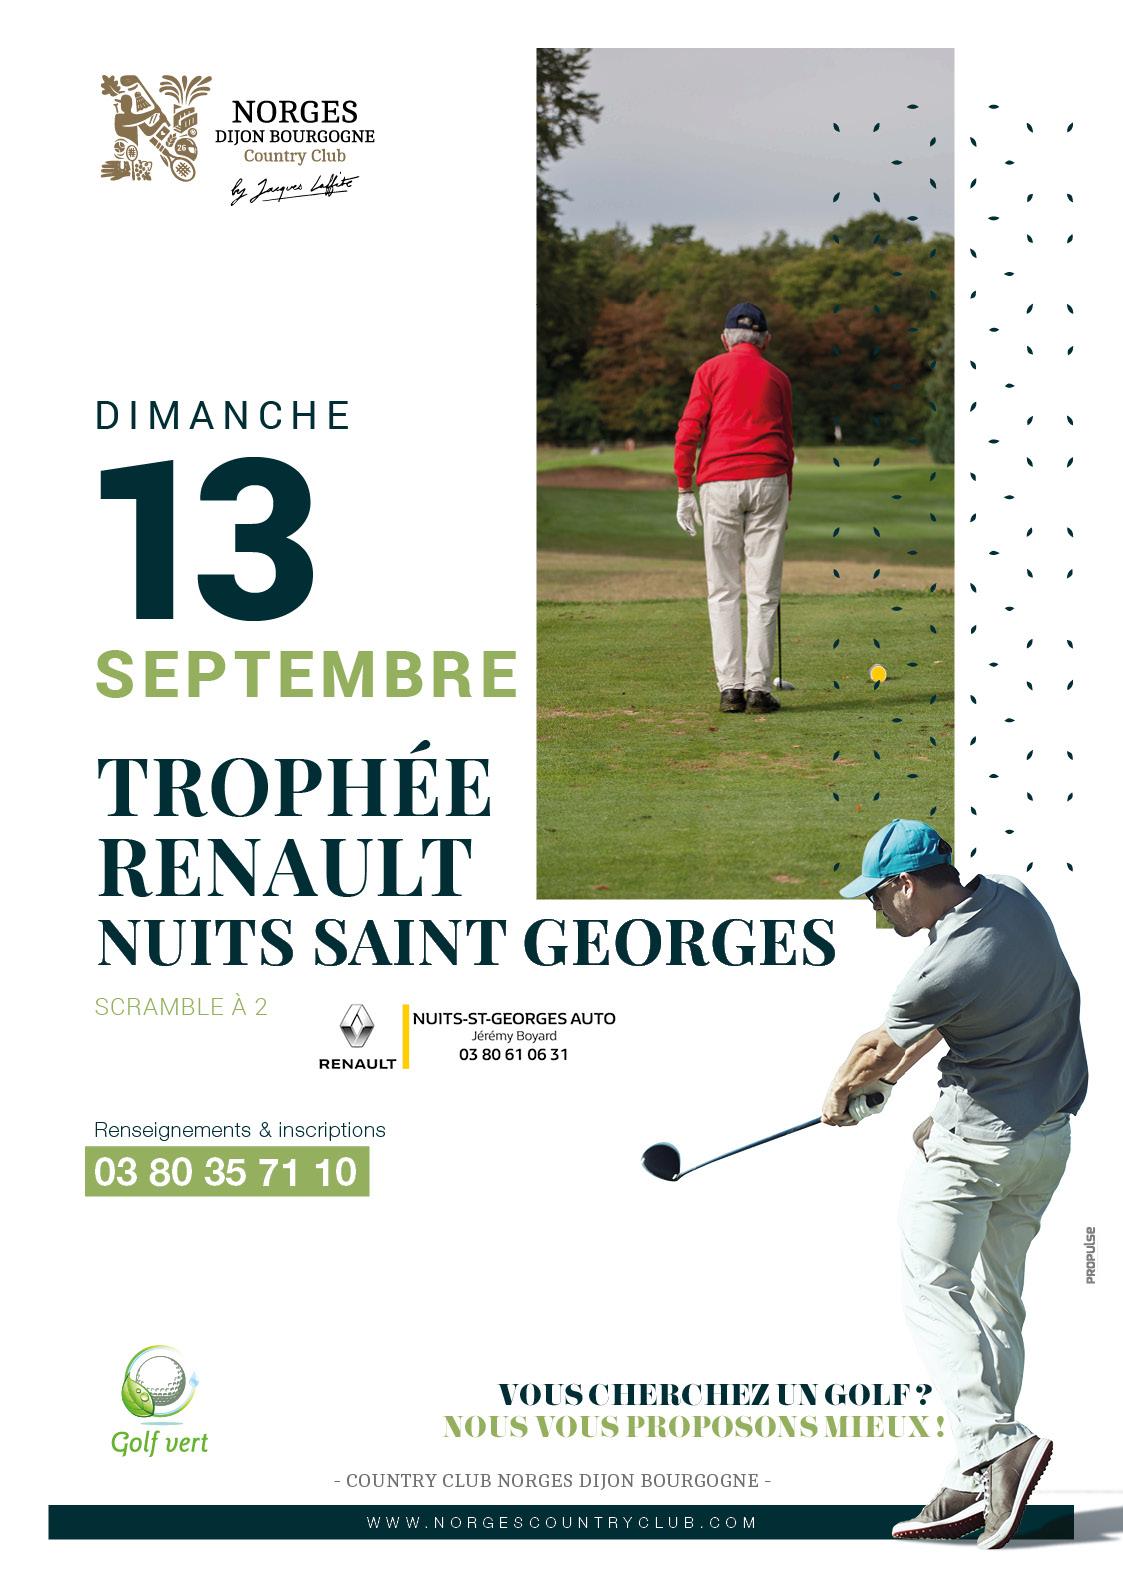 Trophée Renault Nuits-Saint-Georges